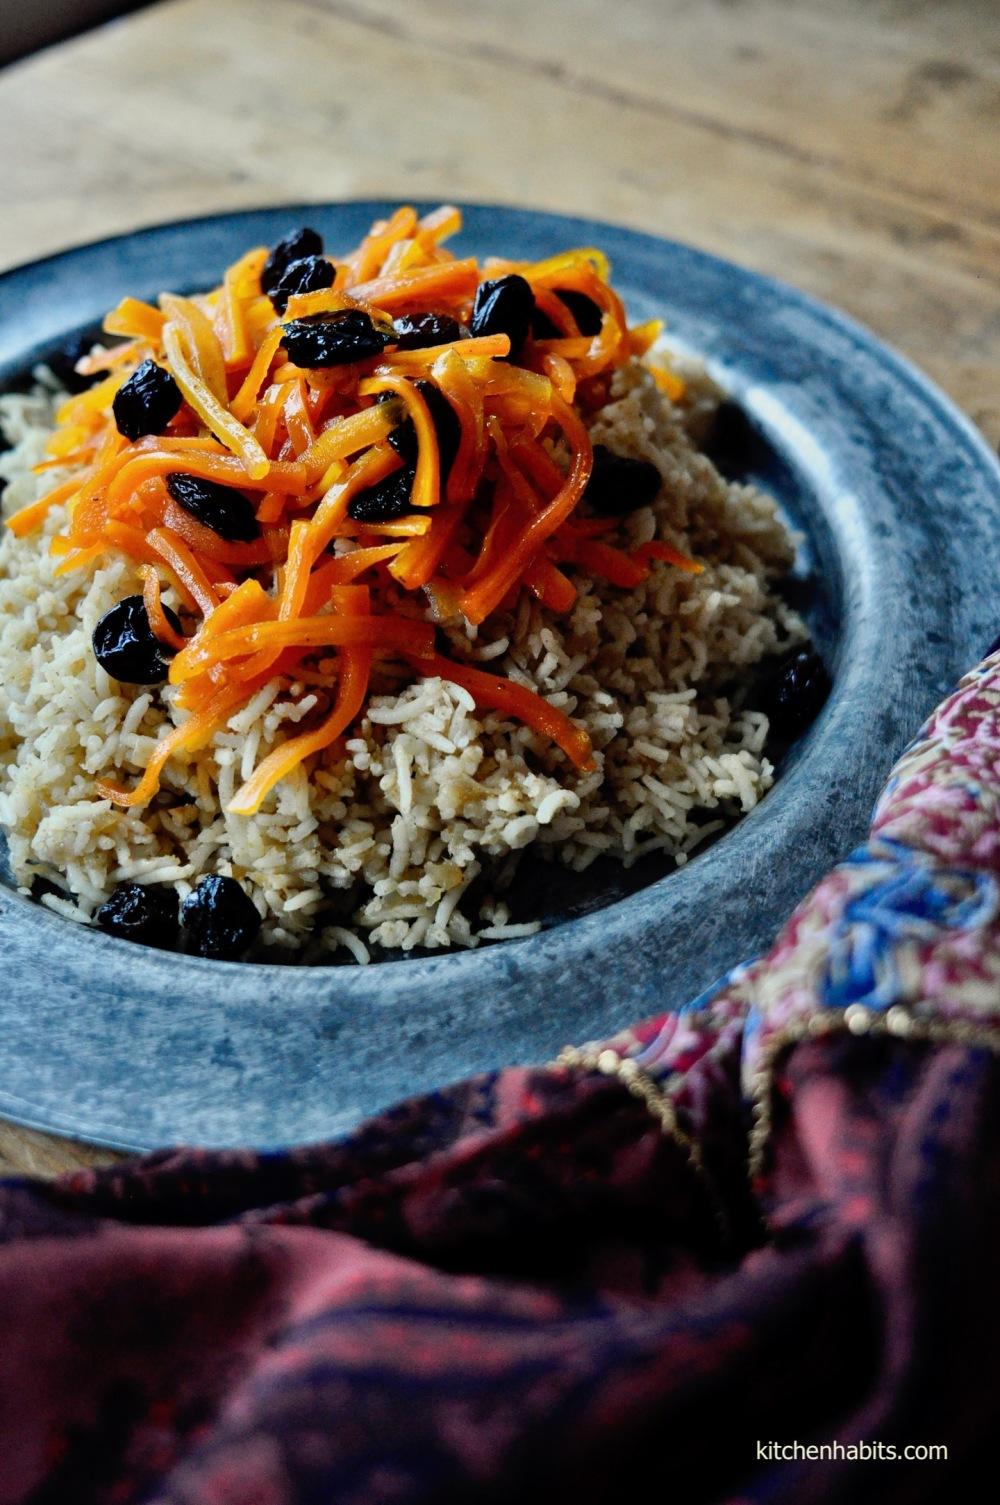 afgan_rice_kitchenhabitscom5